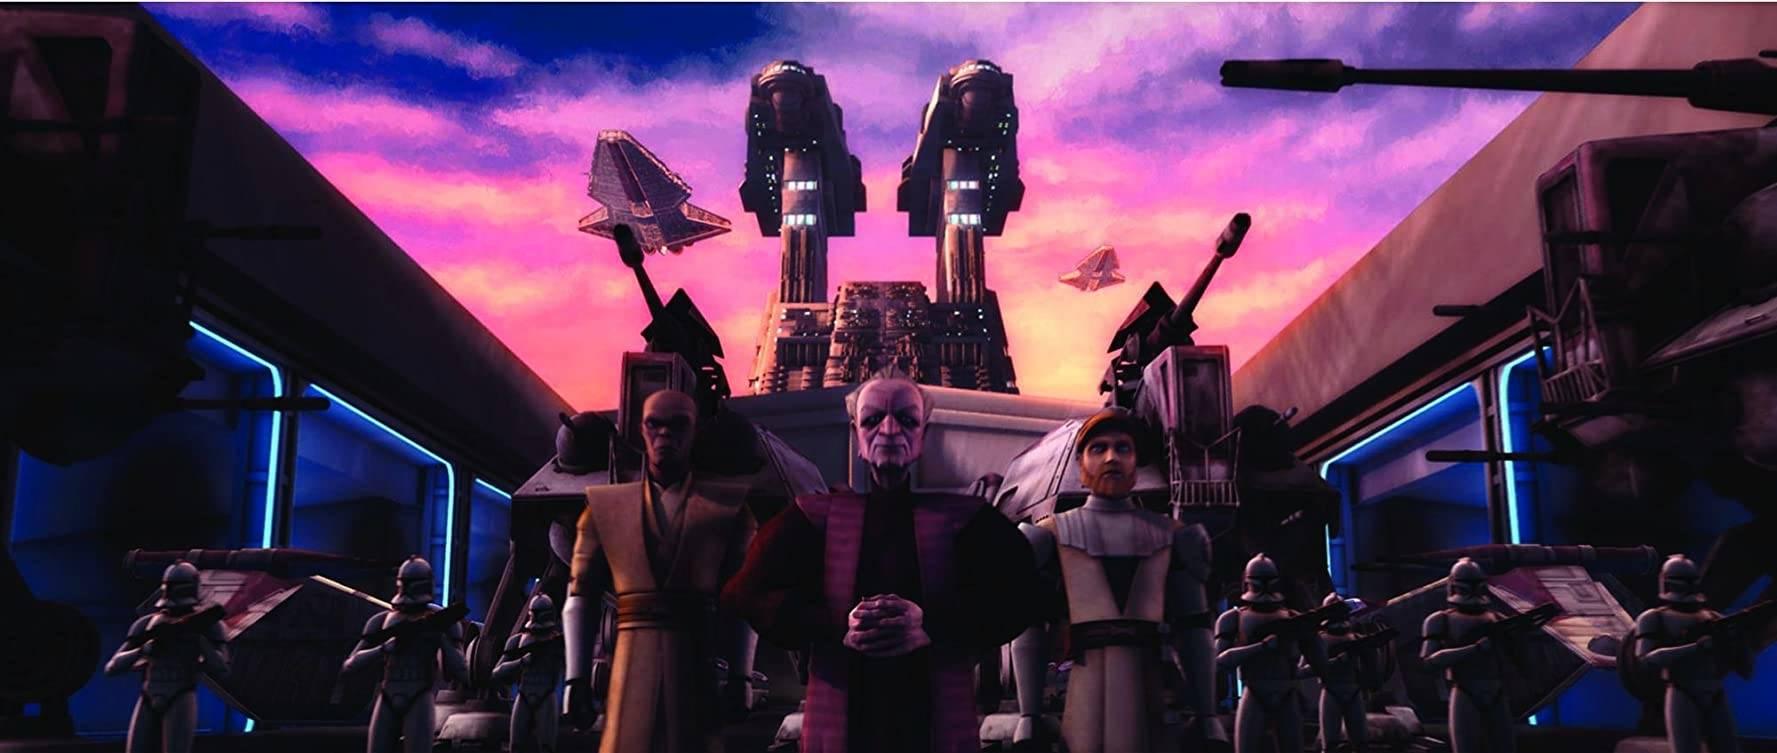 clone wars 2 1